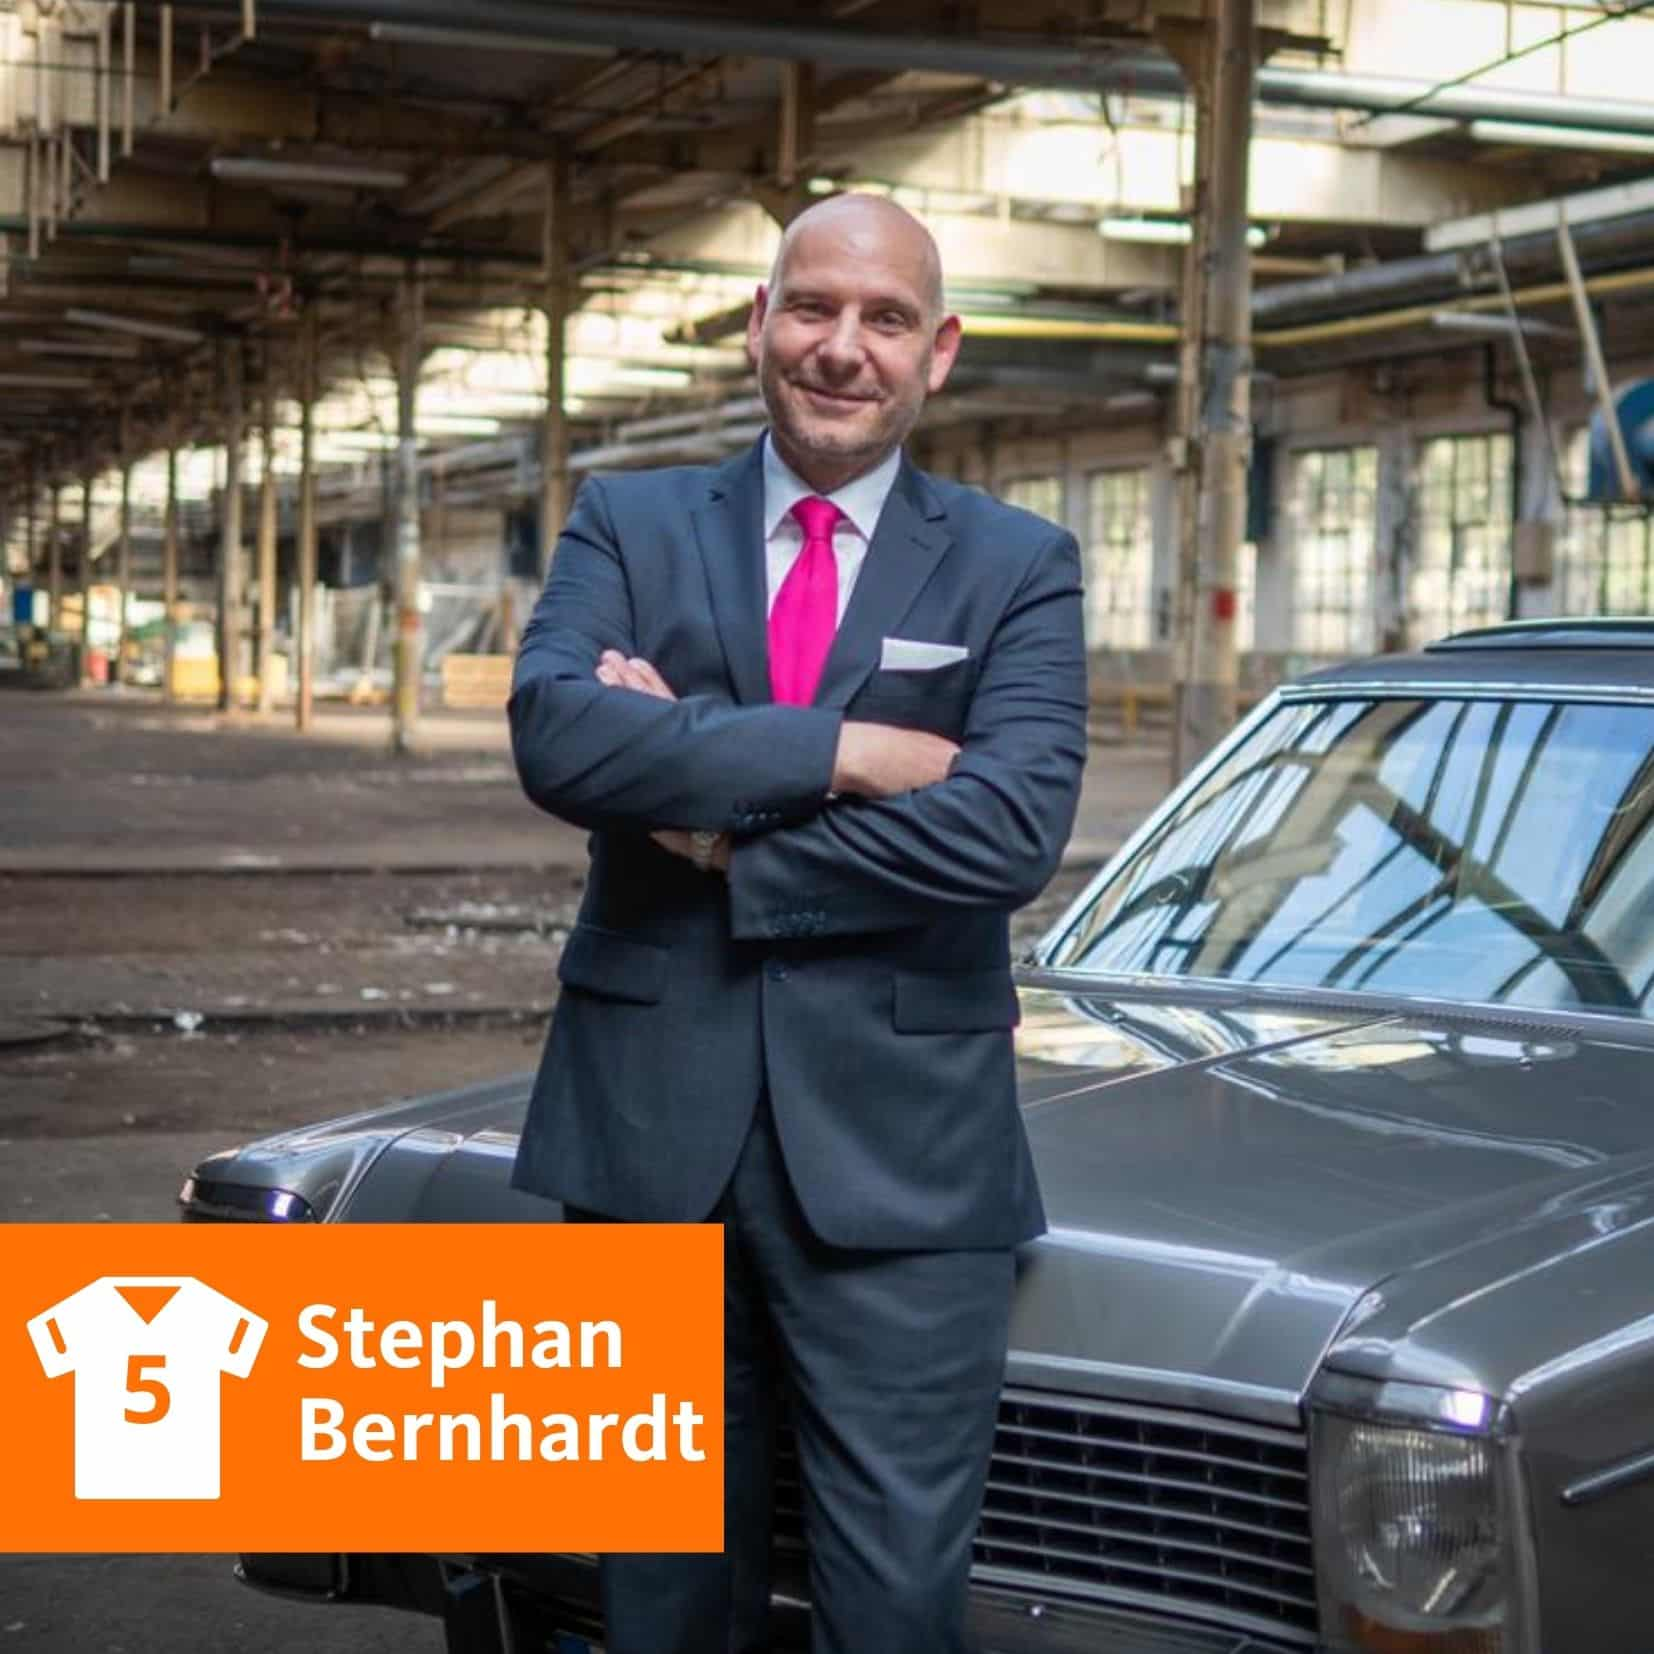 Stephan Bernhardt